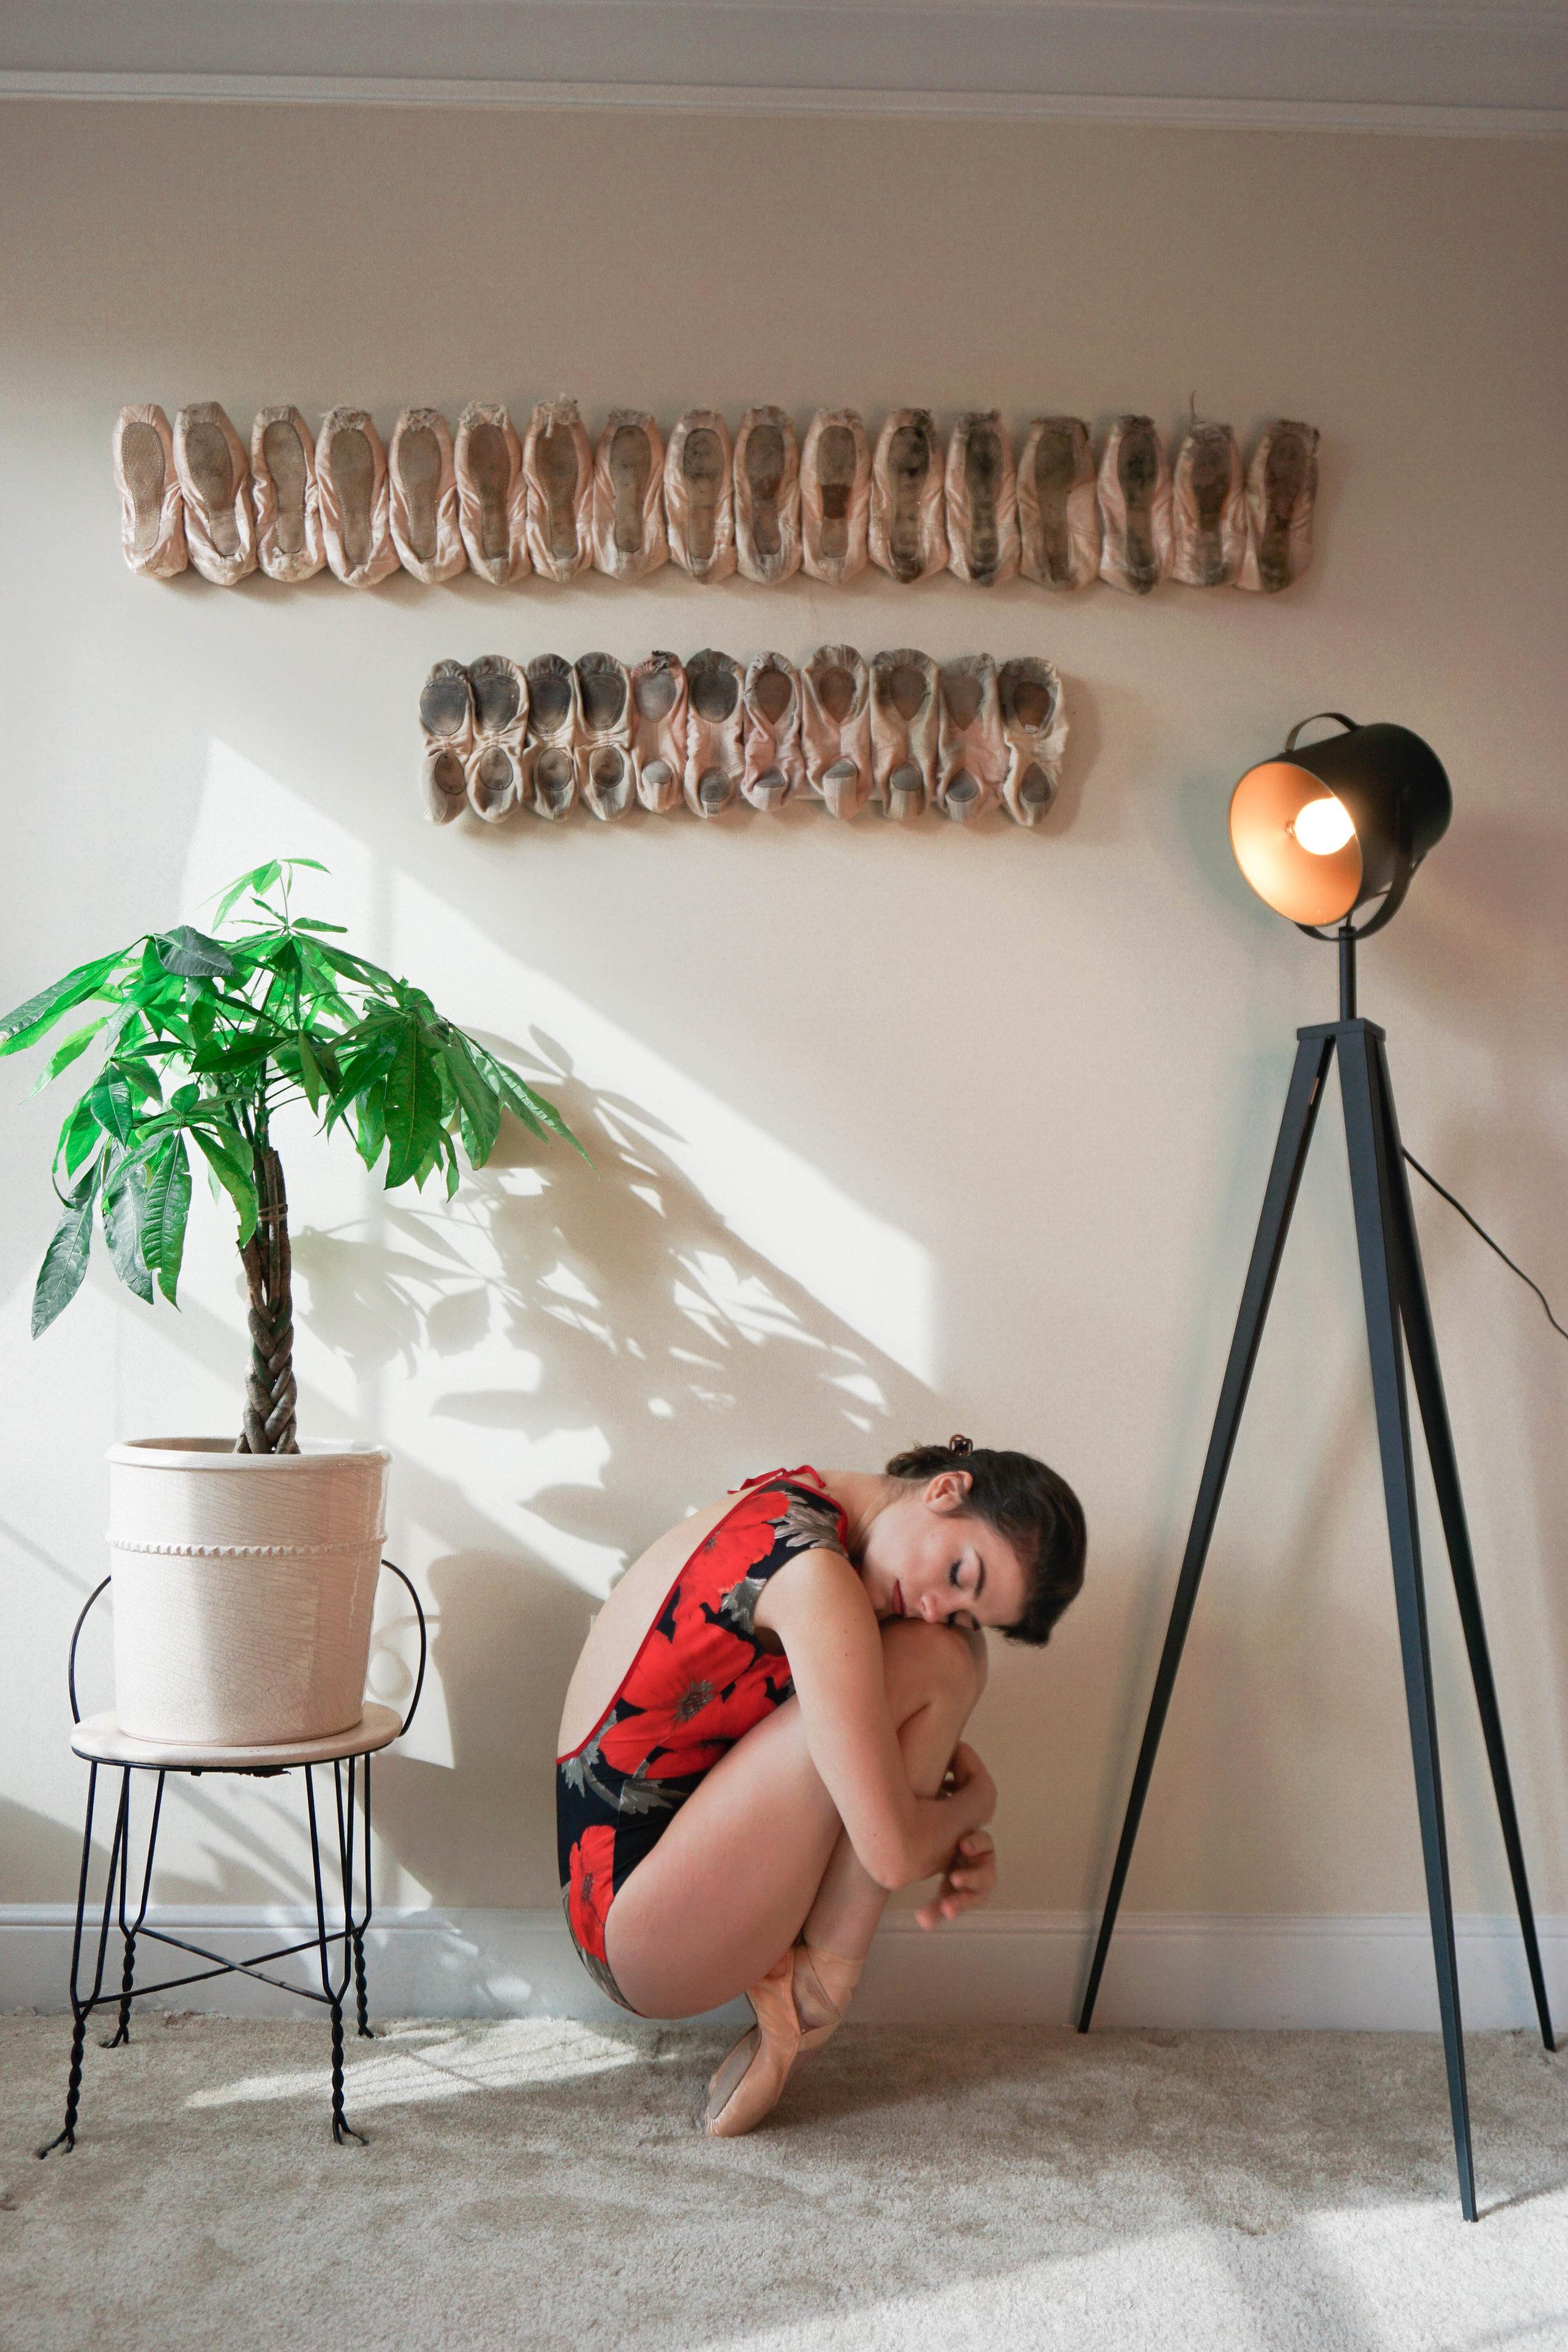 Artiste Tripod Studio Floor Lamp  in black and gold